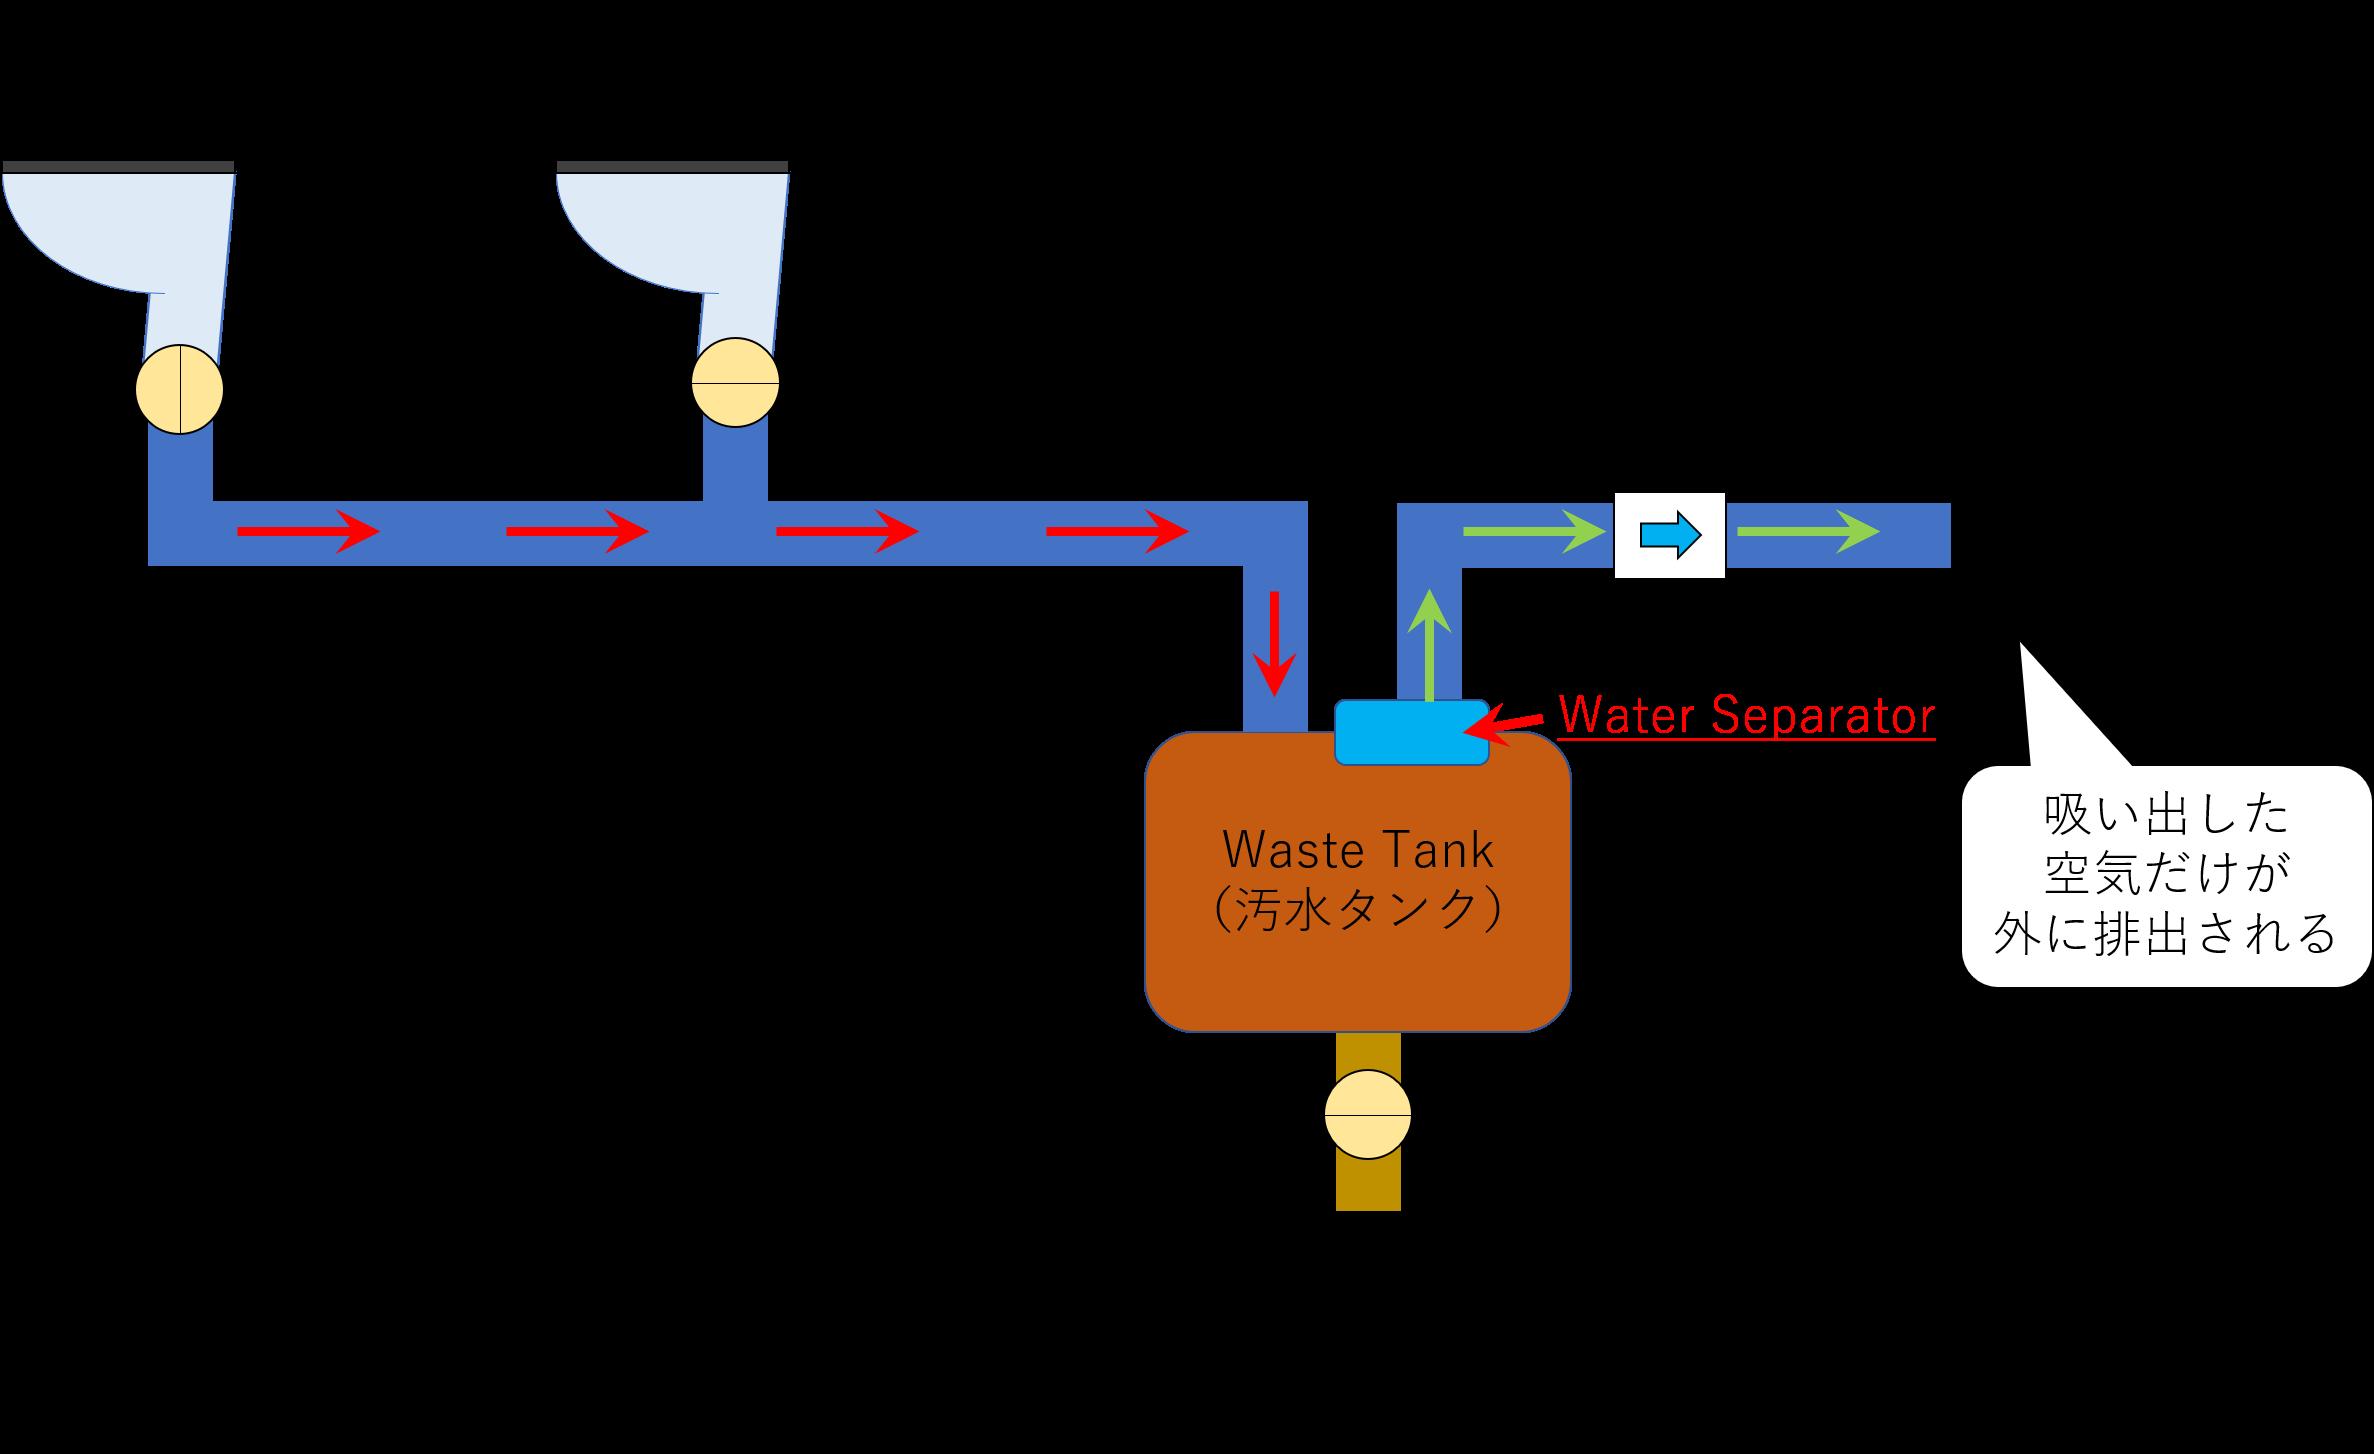 Water Separatorの役割と排出される空気の流れの図